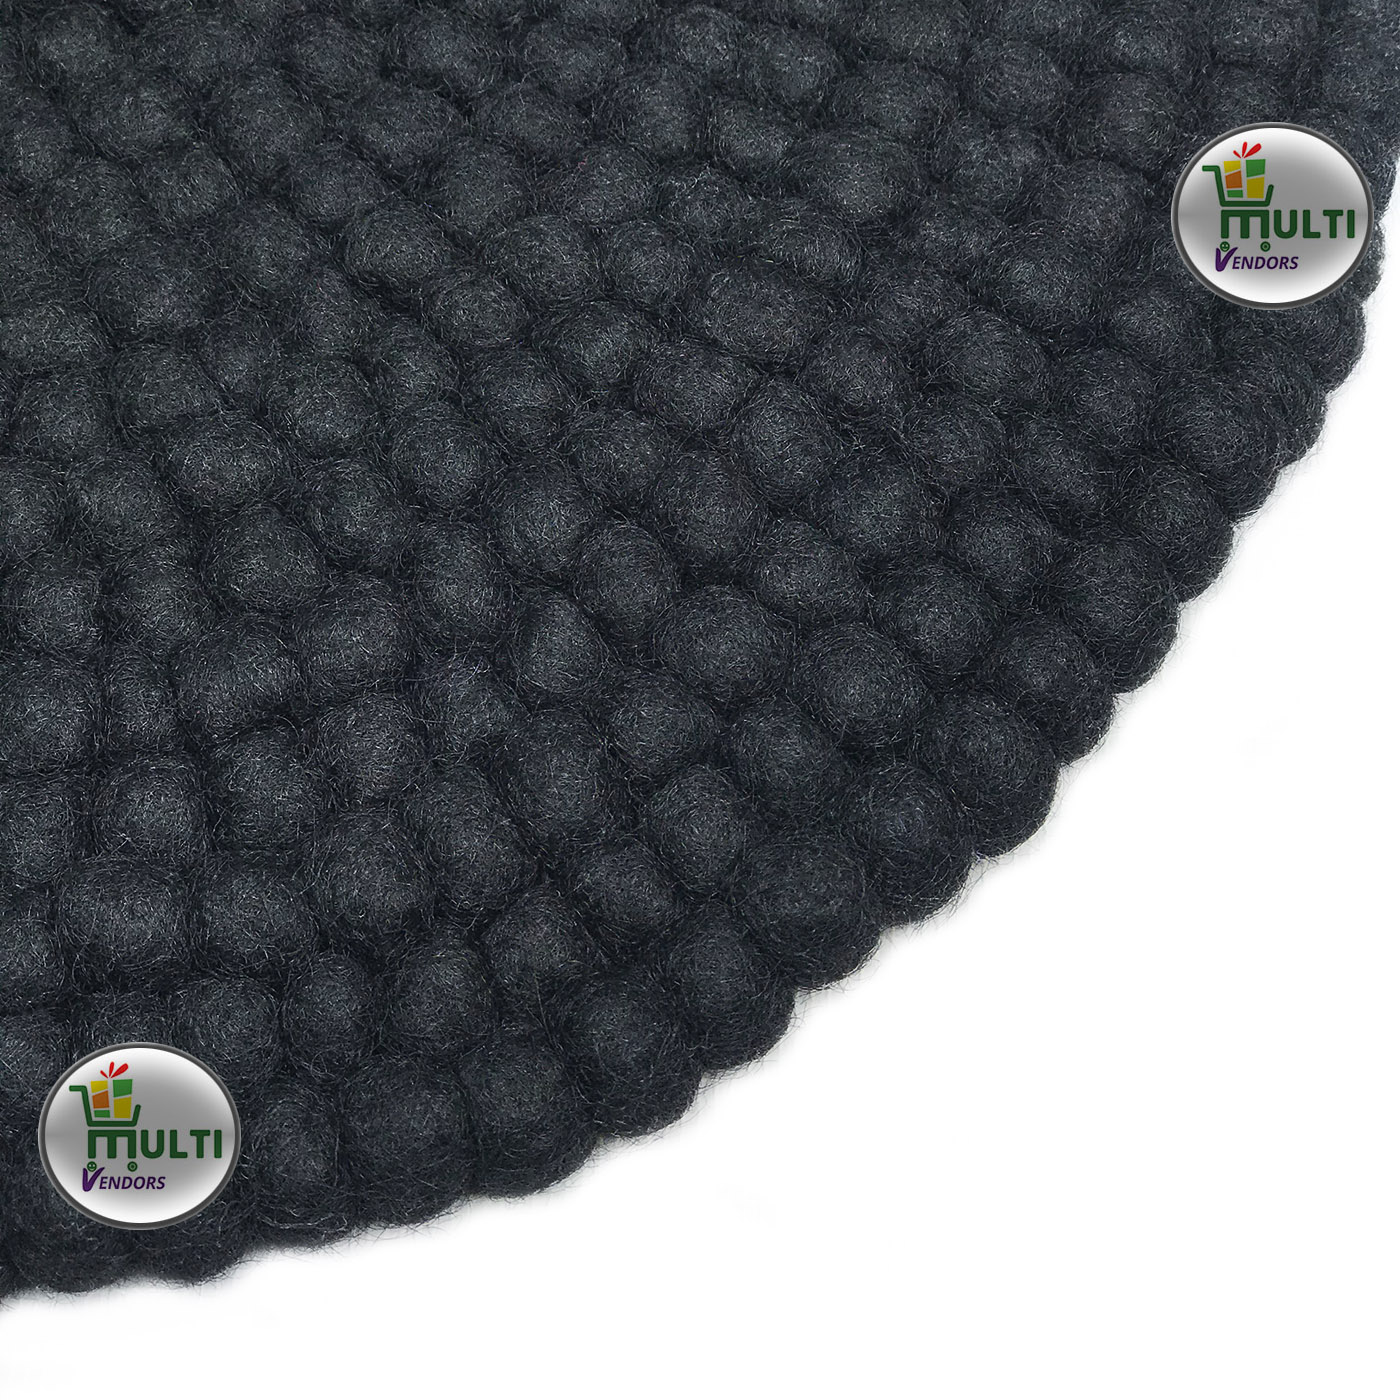 Round Plain Black Felt Ball Rug -BR-21518